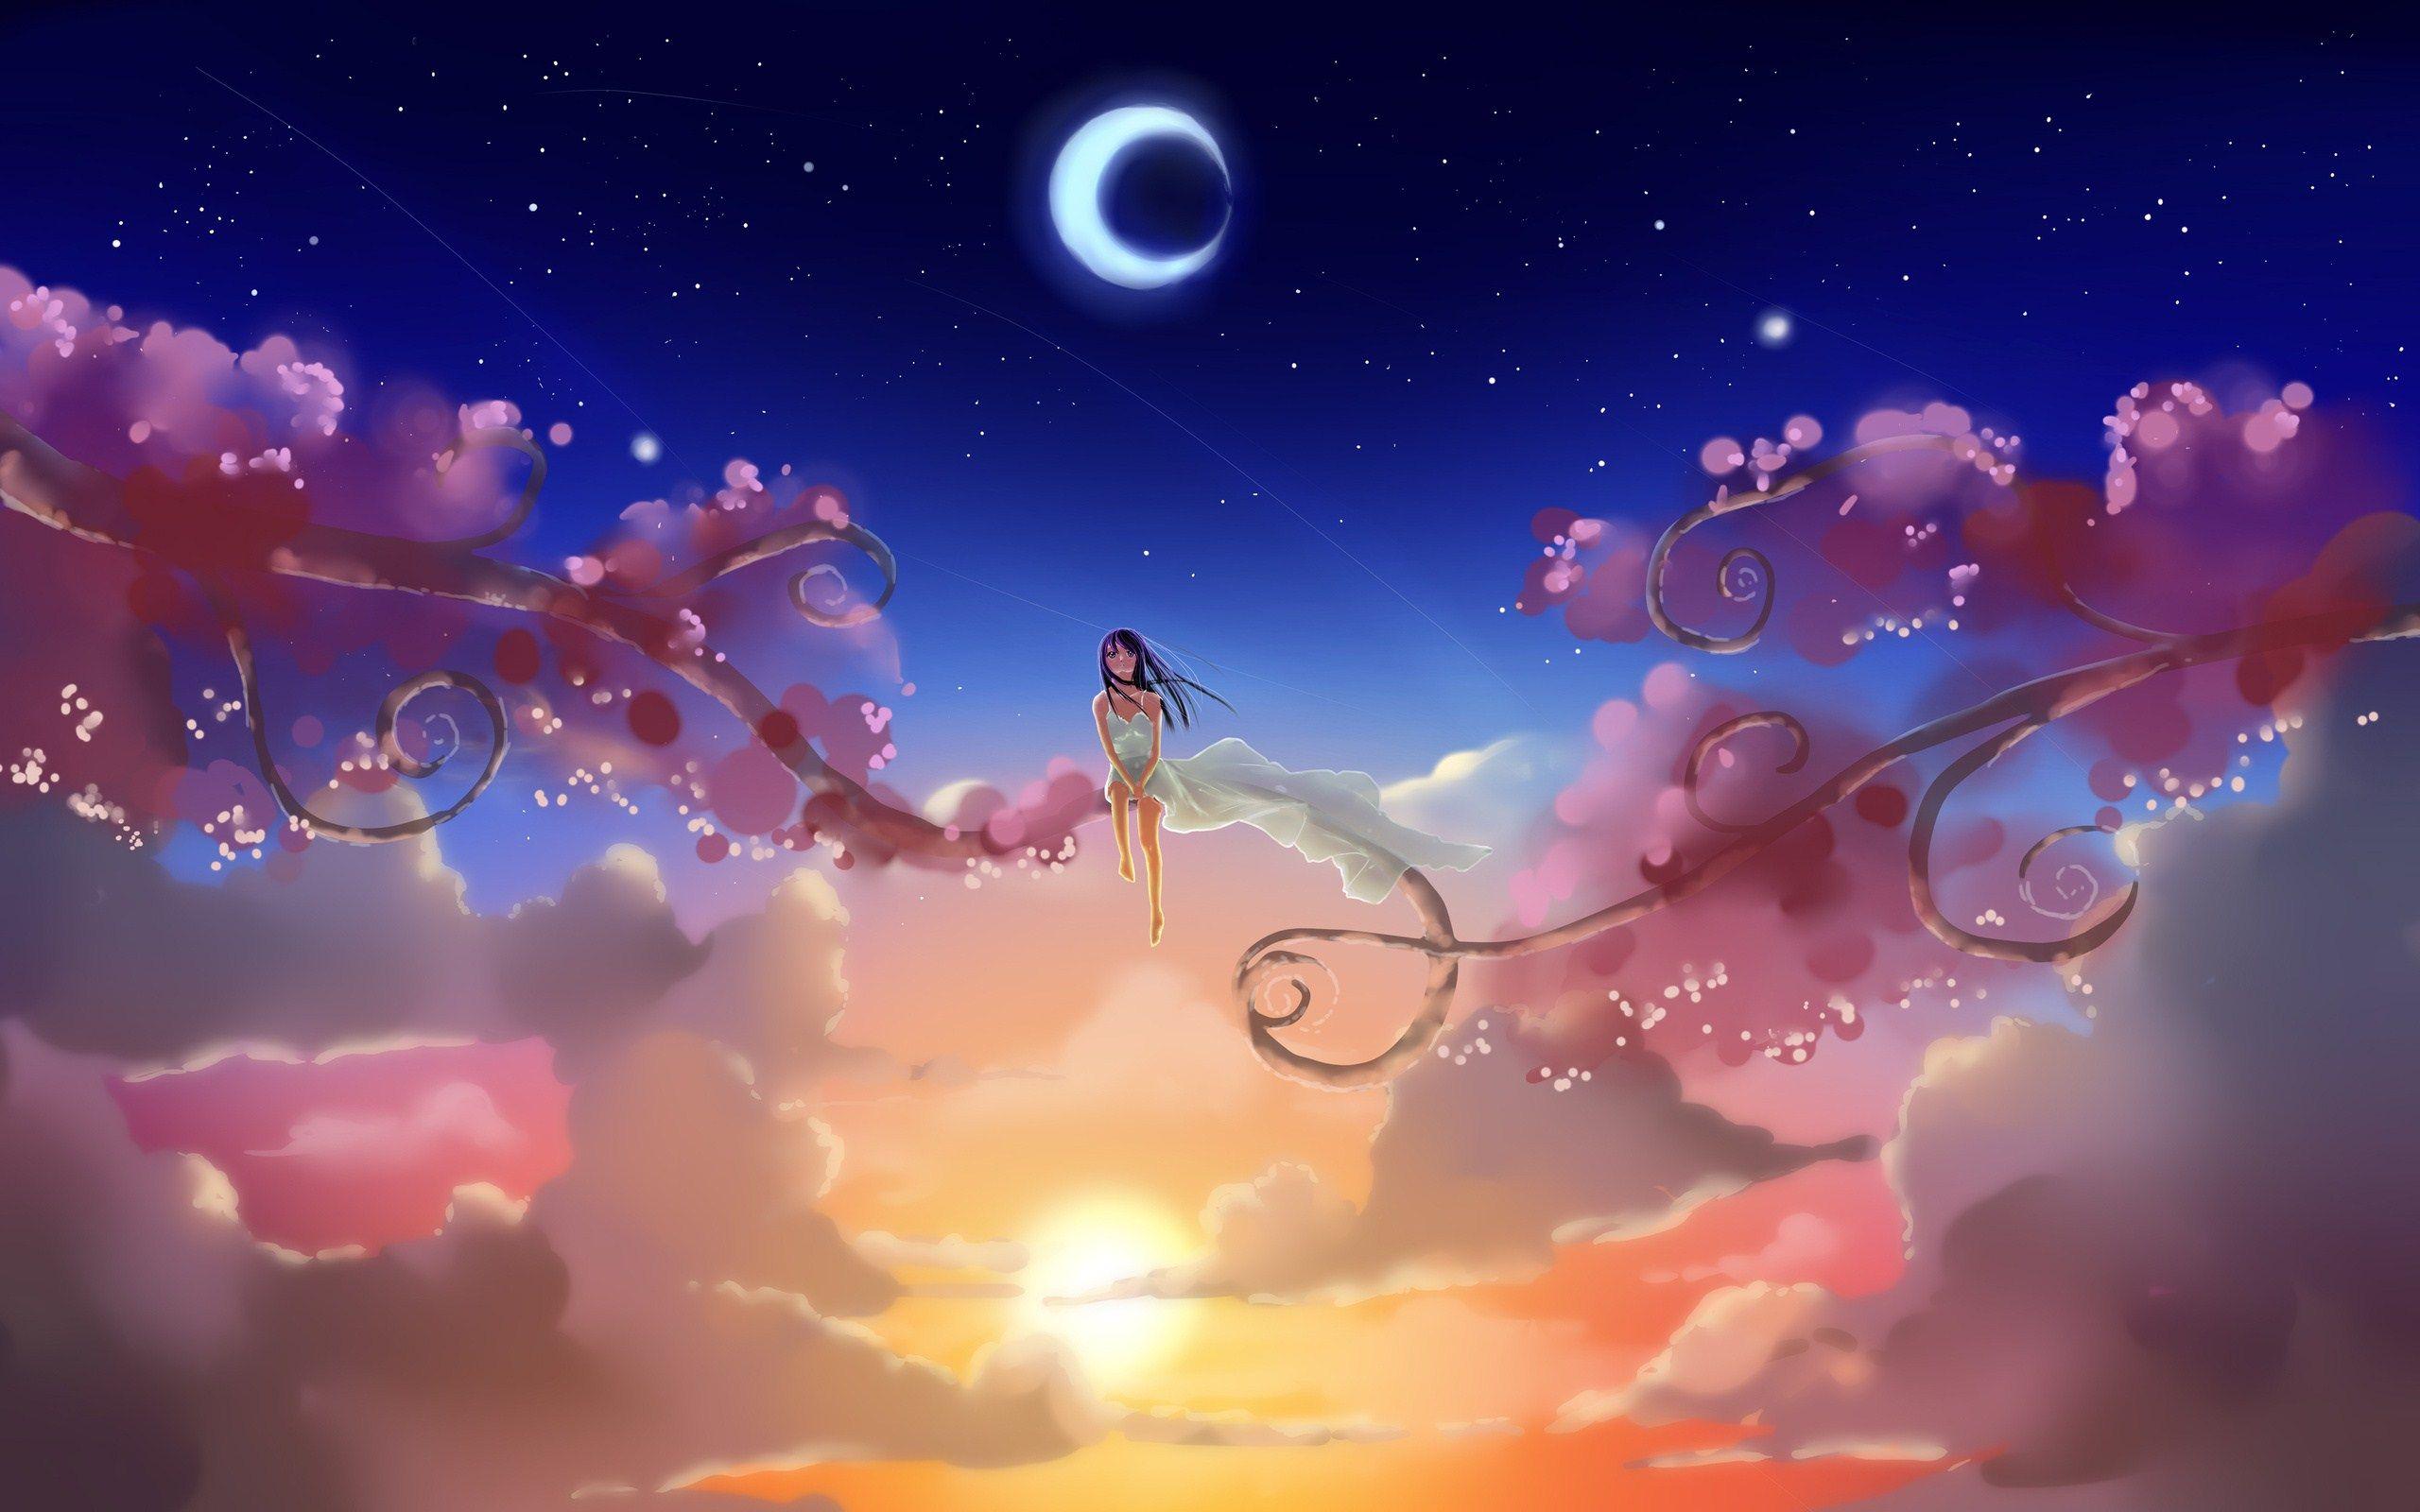 Sensational Paintings Dreamypainting Dreamyimage Dreamybackground Insipirationalbackground Inspirationalwallpaper Pemandangan Anime Gambar Manga Fantasi